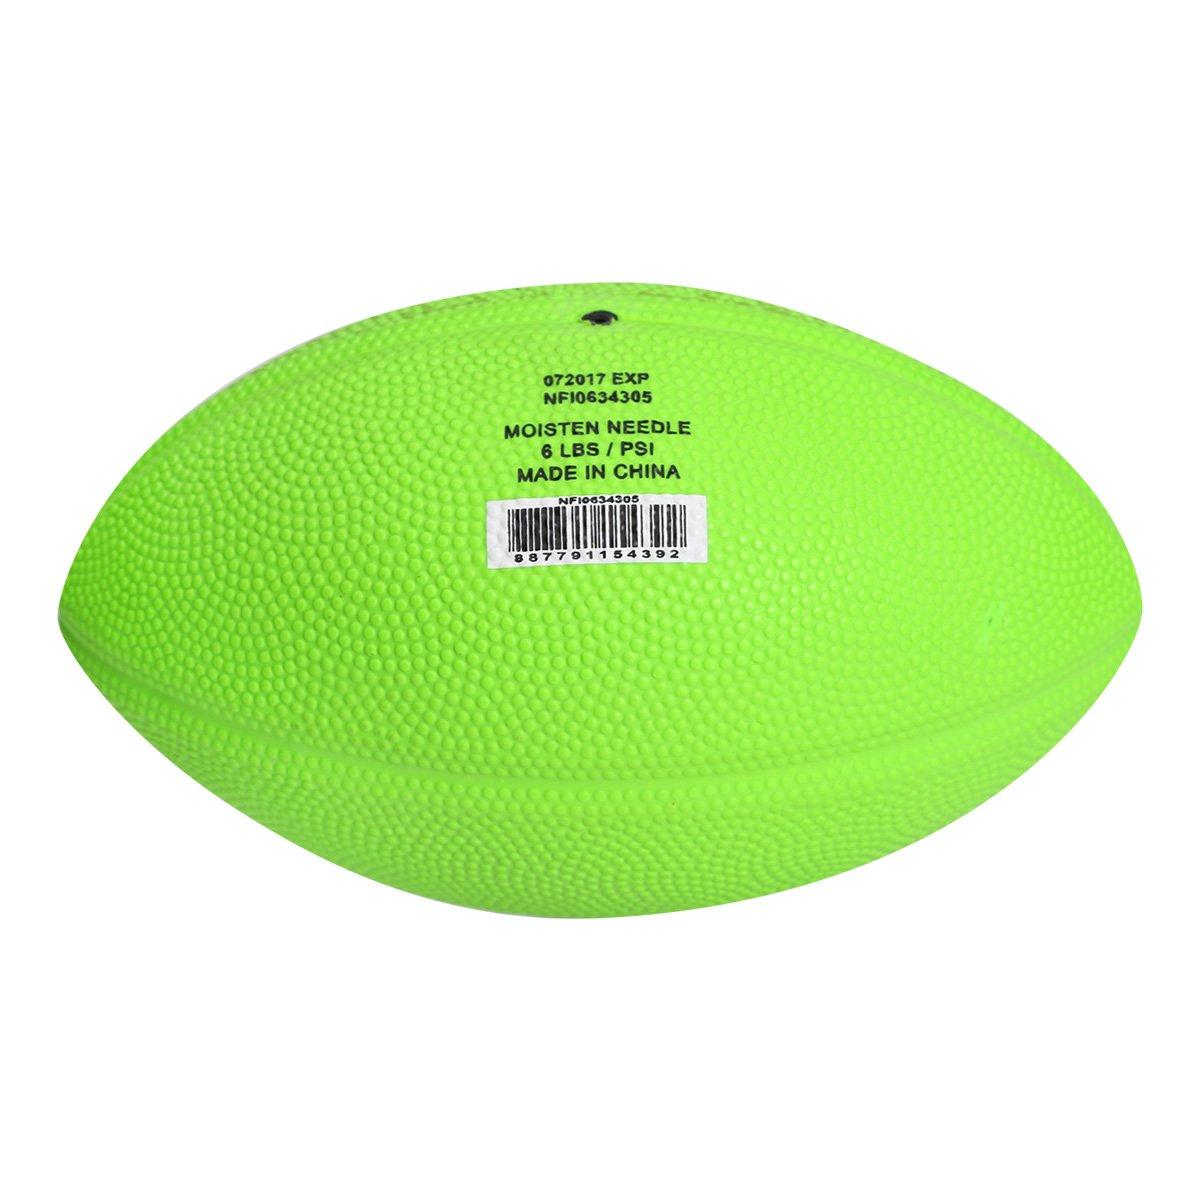 ef95945f9 ... Bola de Futebol Americano Nike 500 Mini 4.0 FB 5 - Tamanho 3 - 1